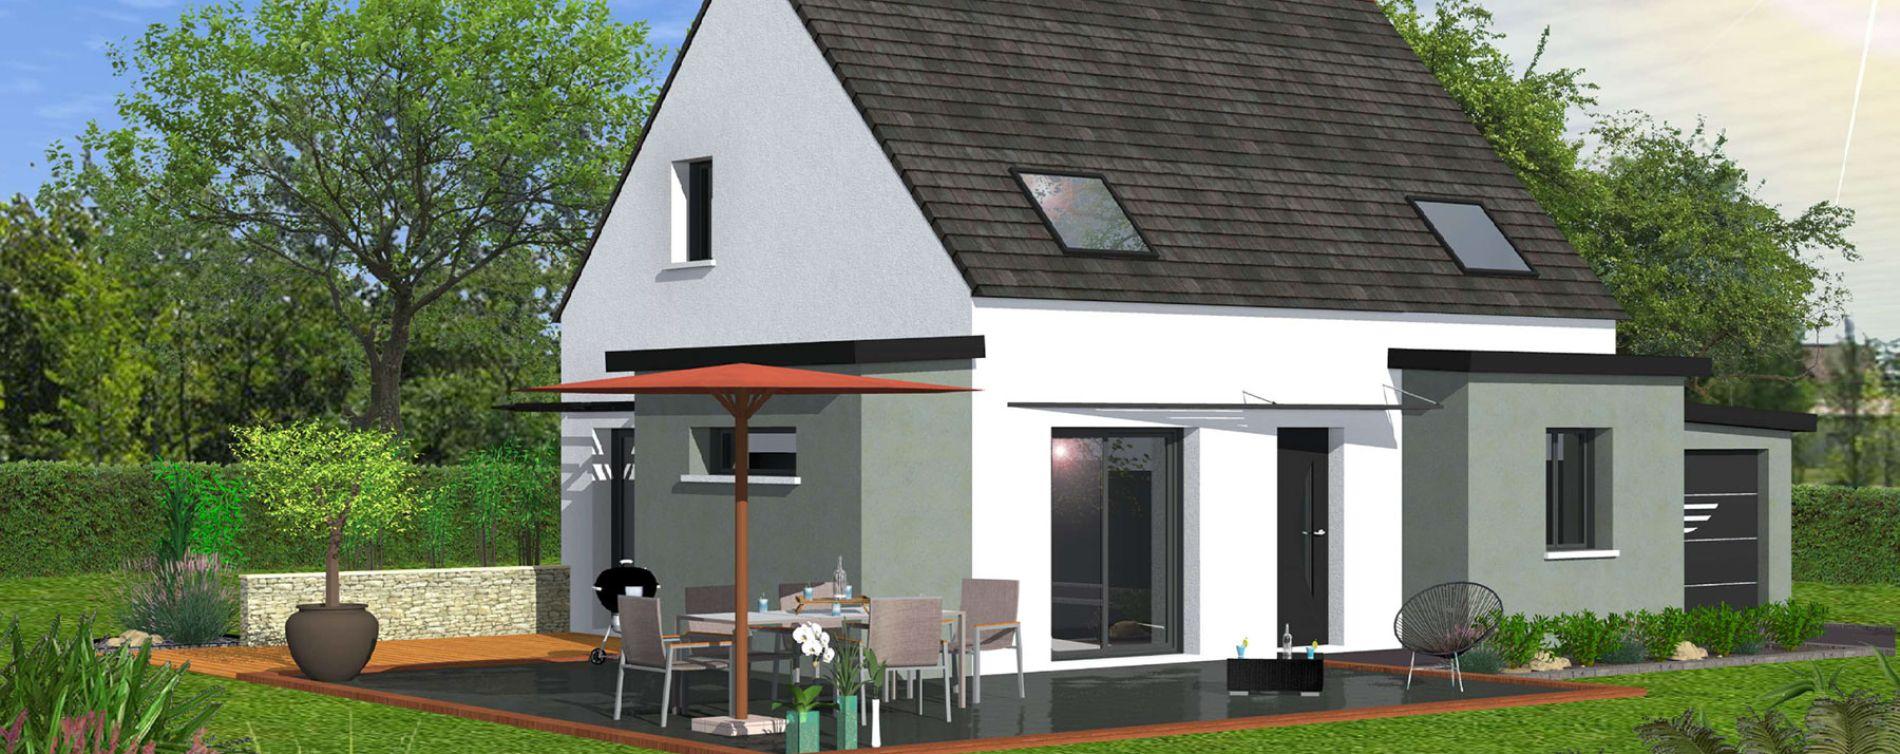 Ploudalmézeau : programme immobilier neuve « Roscaroc » (2)